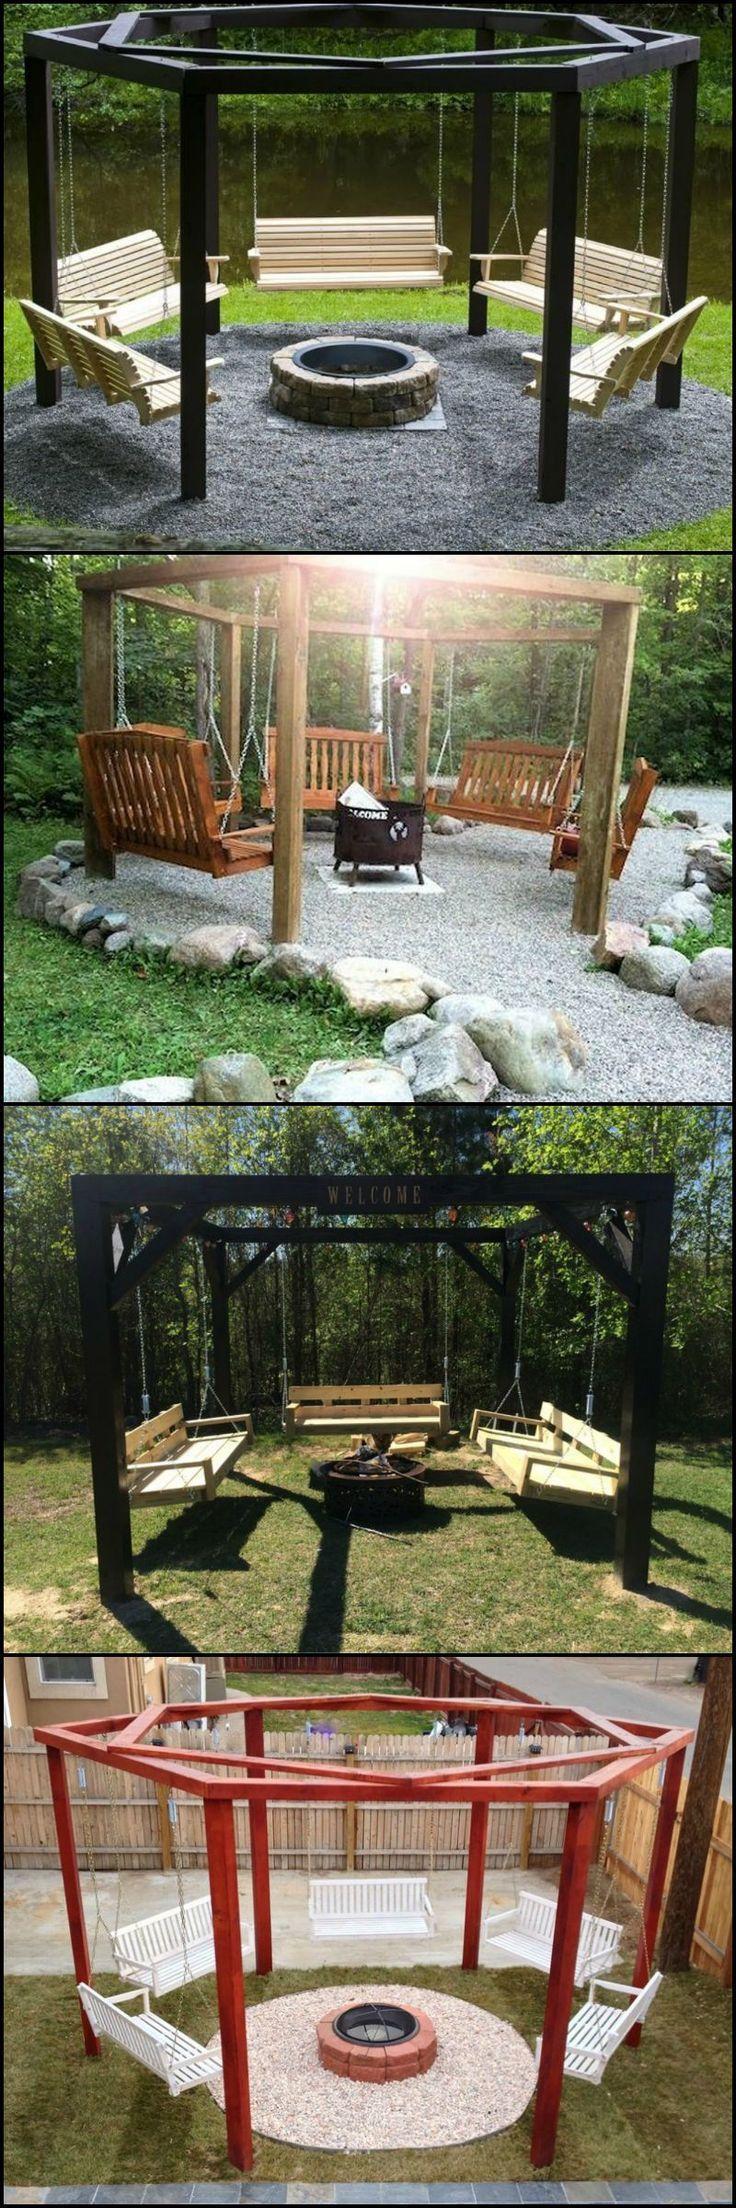 Feuerstelle-Schaukel-Sets - #backyard #FeuerstelleSchaukelSets #backyardoasis